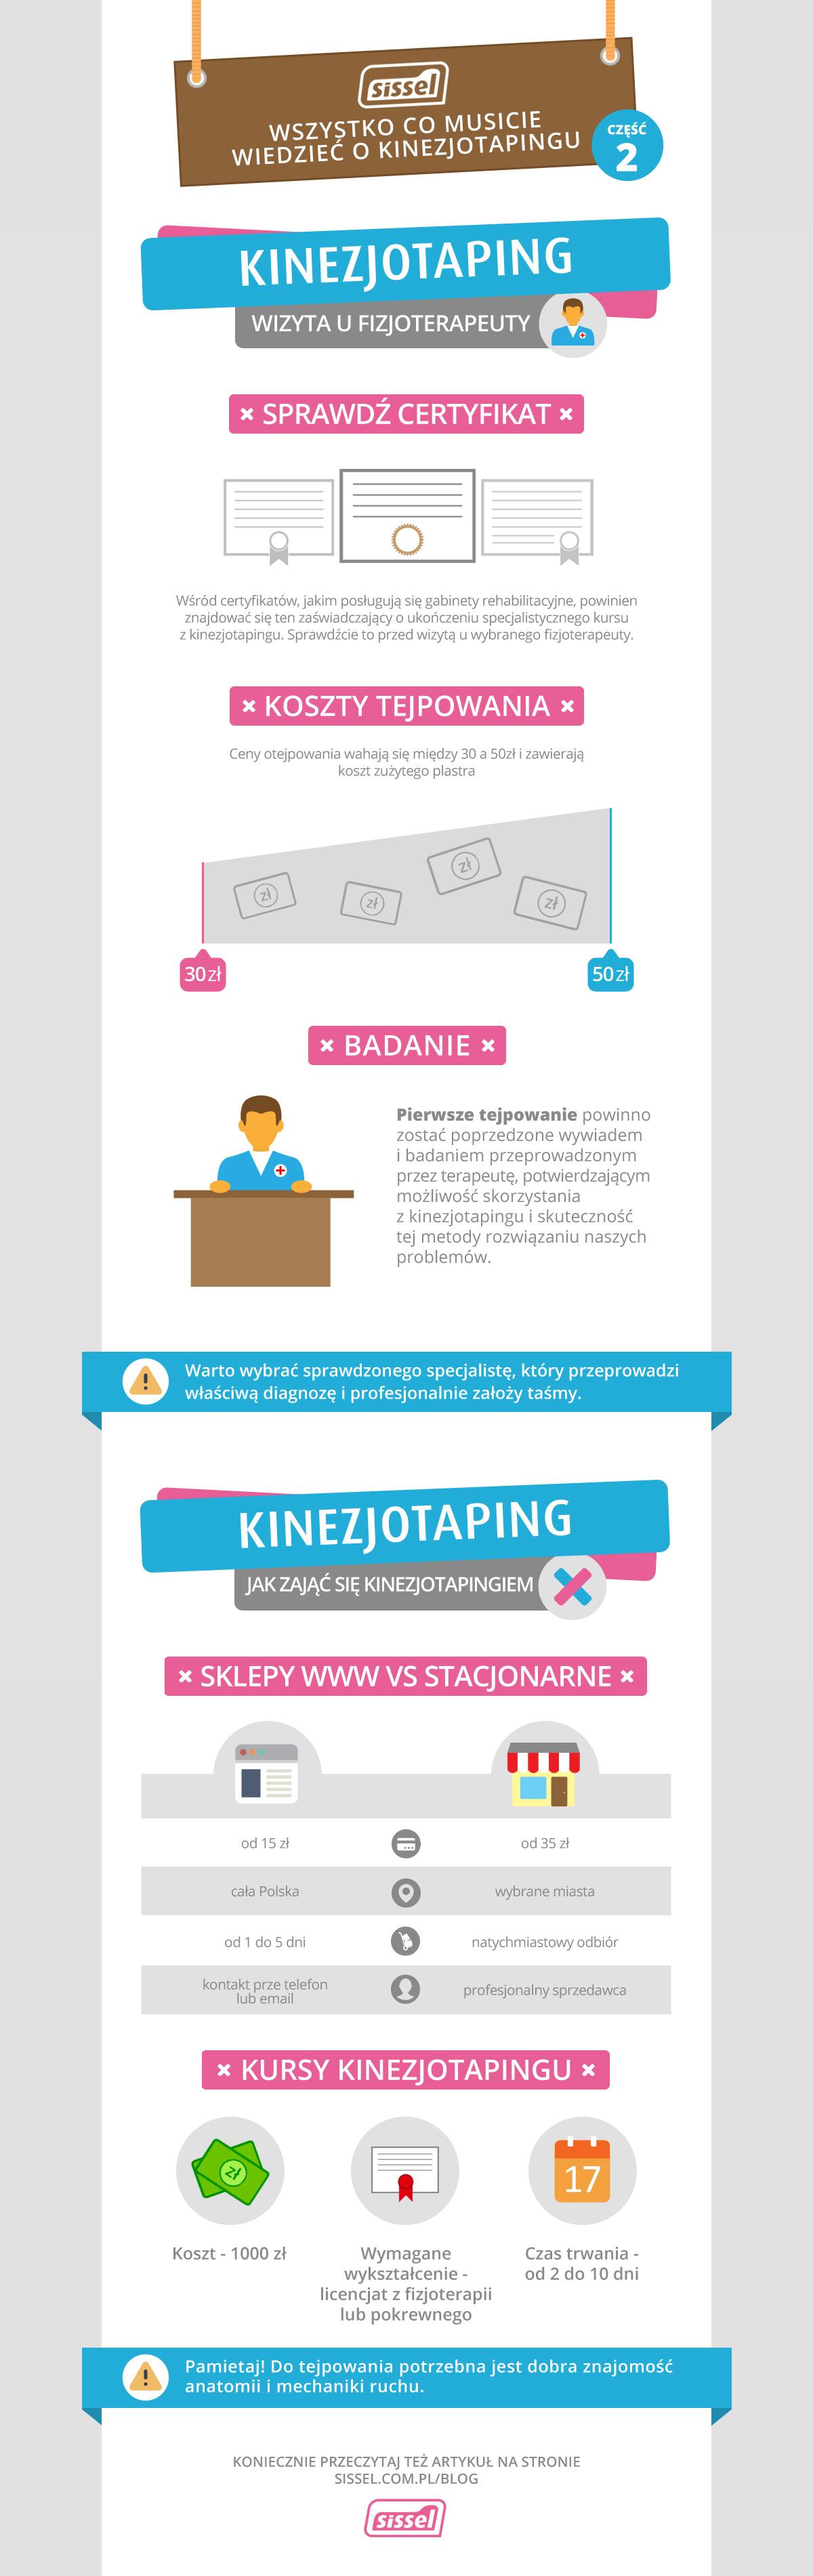 infografika-kinezjotaping-2